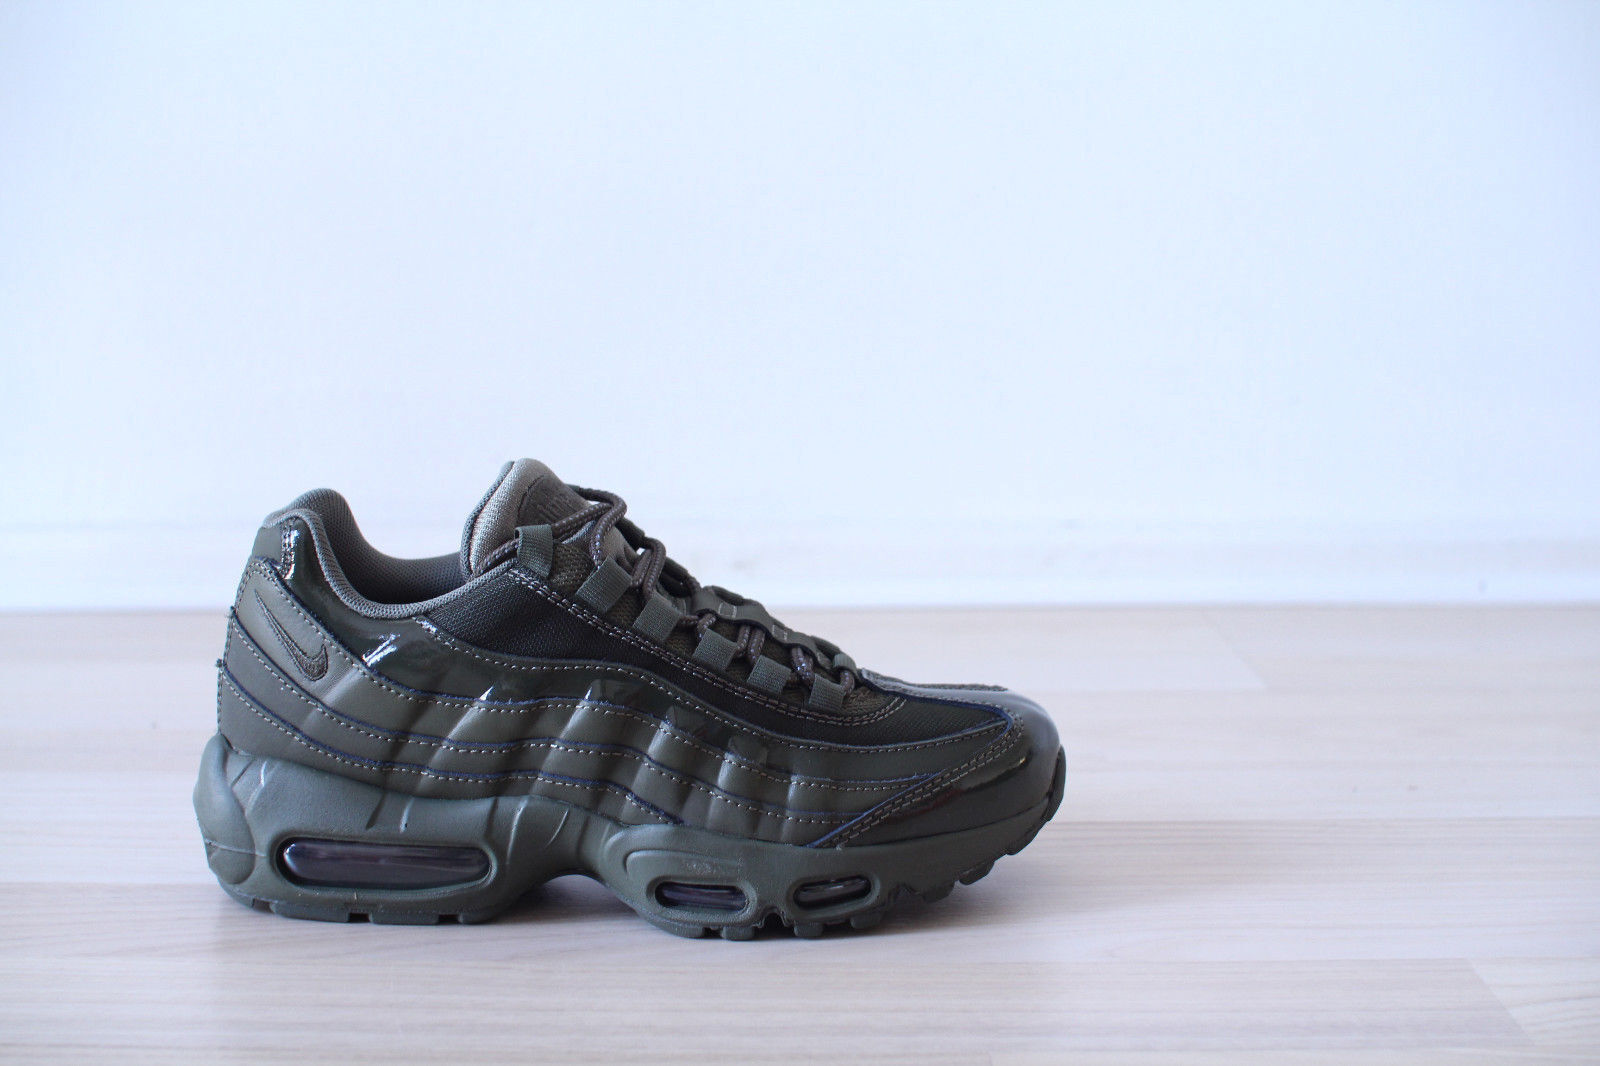 Nike Air Max 95 Wmns Khaki Green Size 38 UK 4,5 NEW & OVP